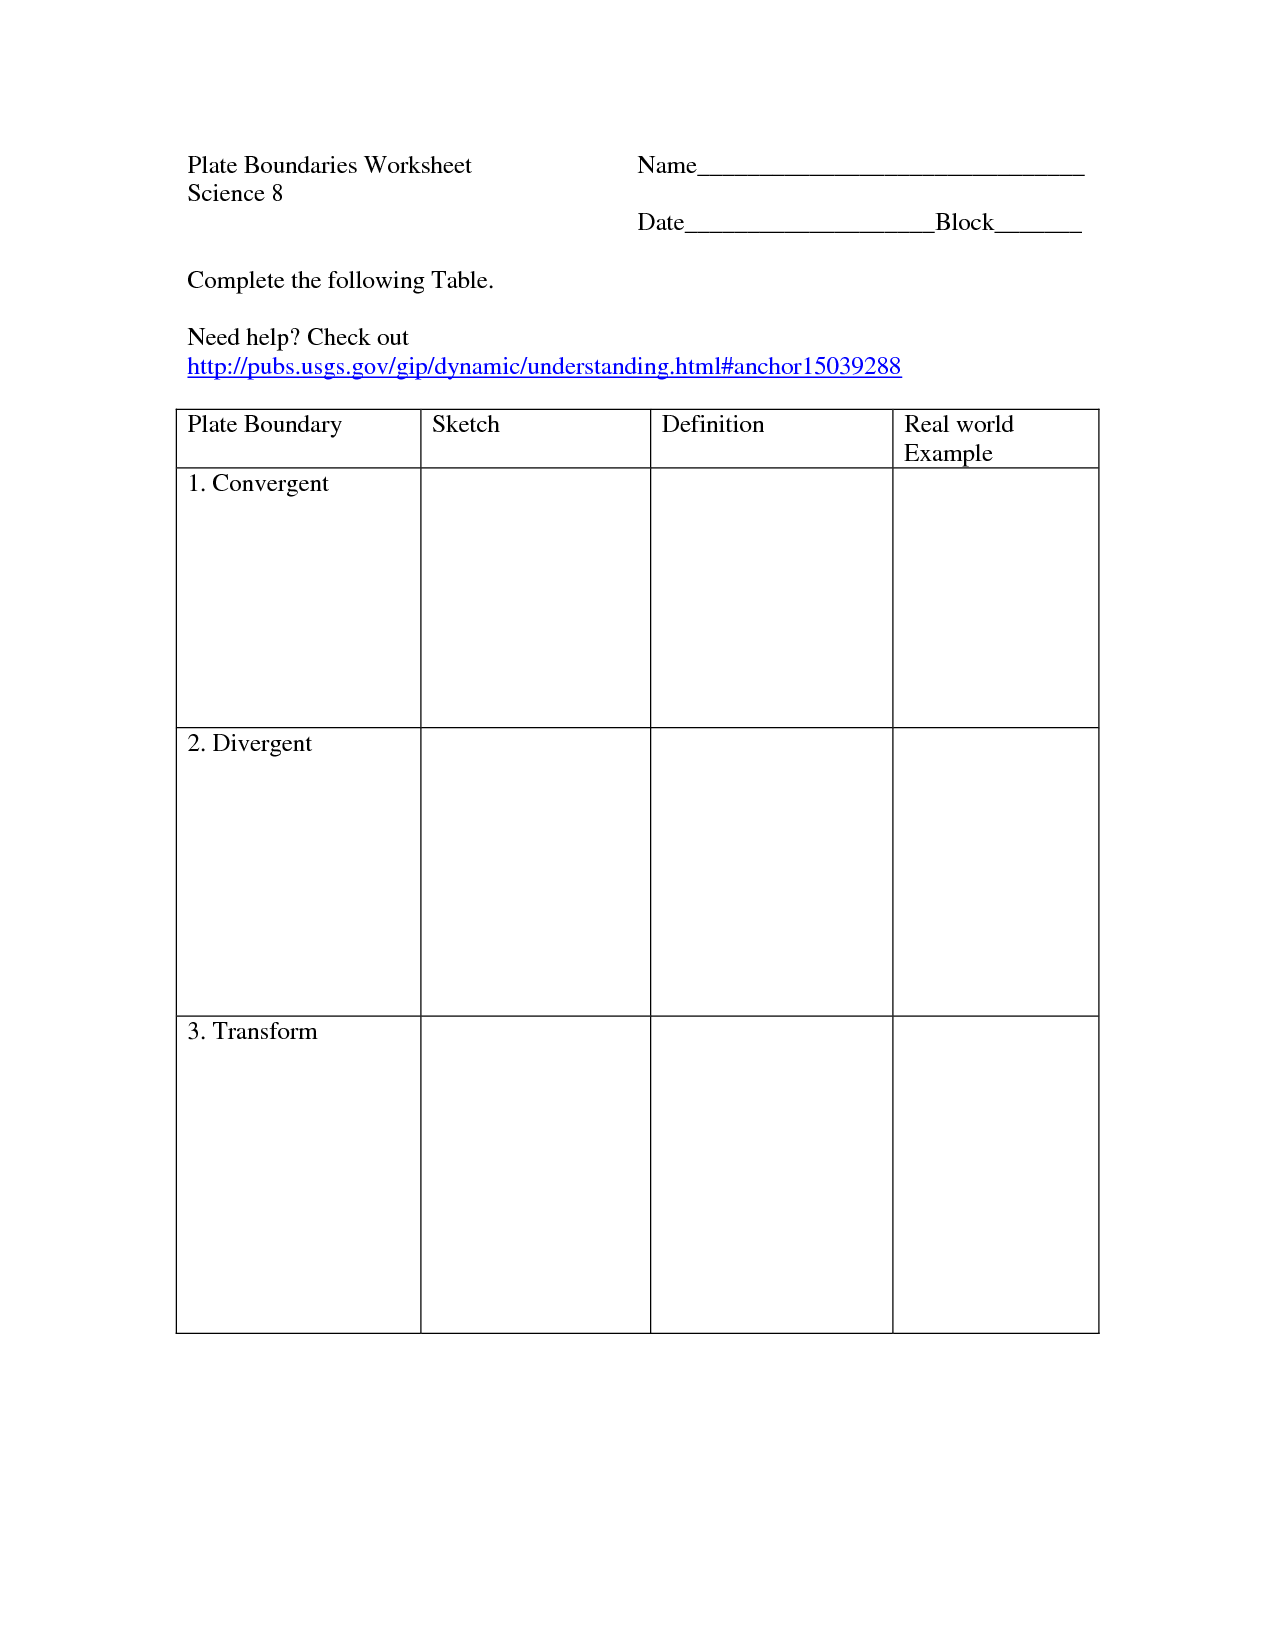 Establishing Boundaries Worksheet